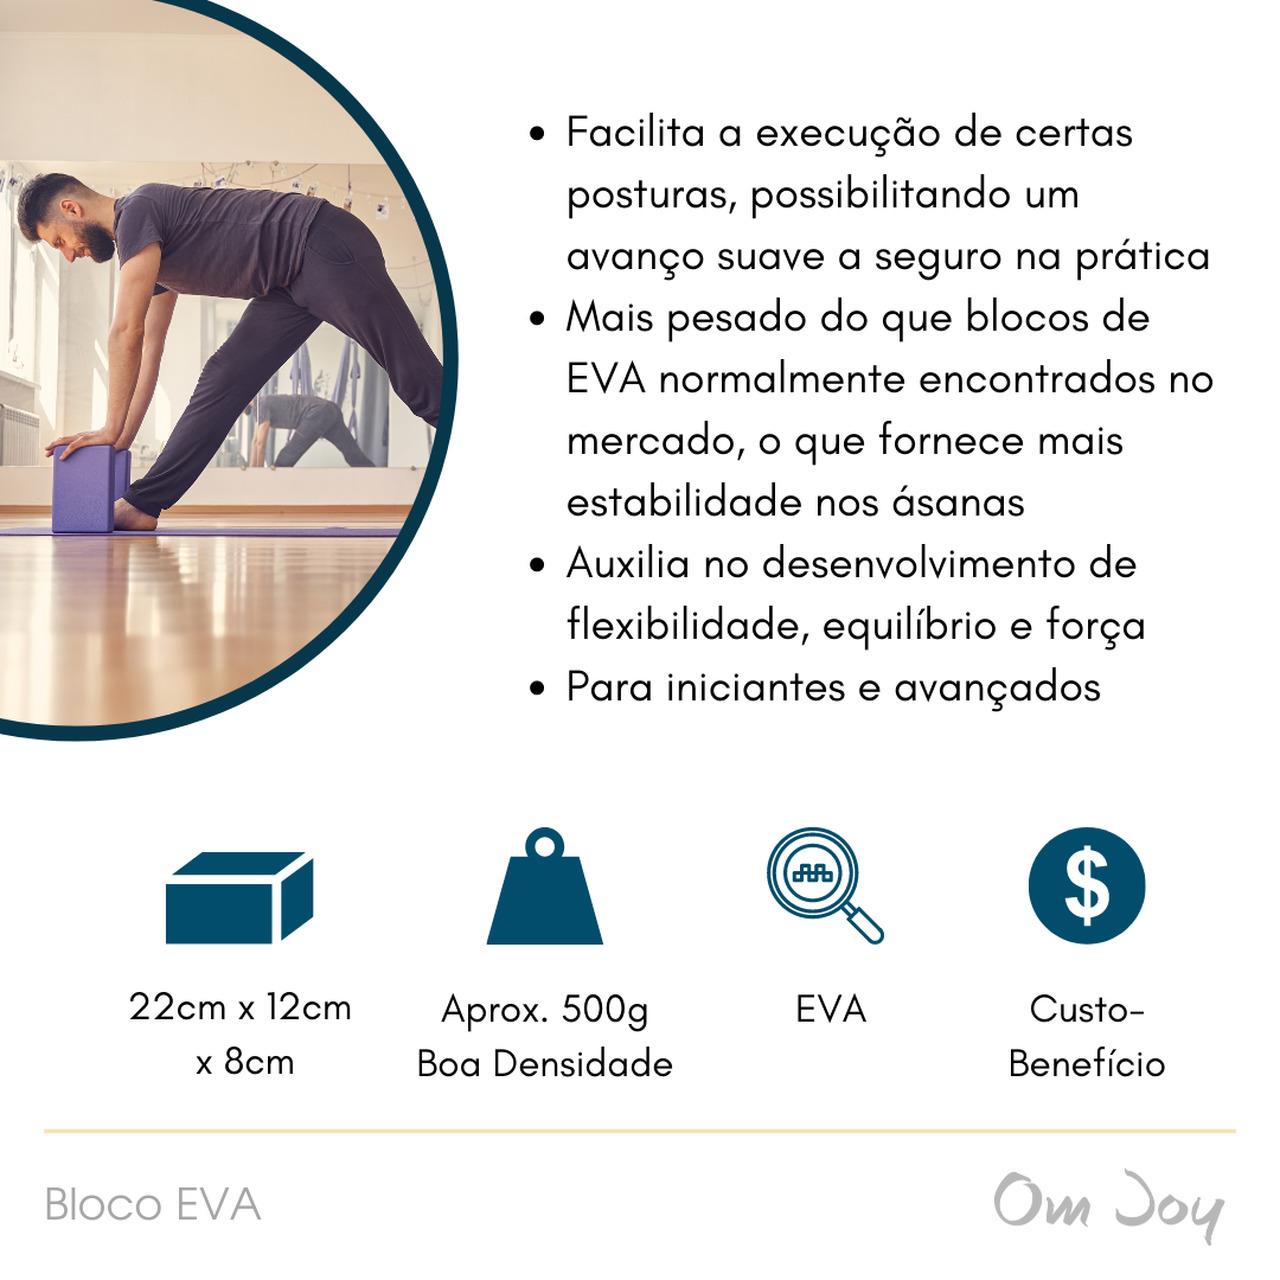 Kit Básico Iniciante Yoga: Tapete + 2 Blocos EVA + 1 Cinto de Alongamento